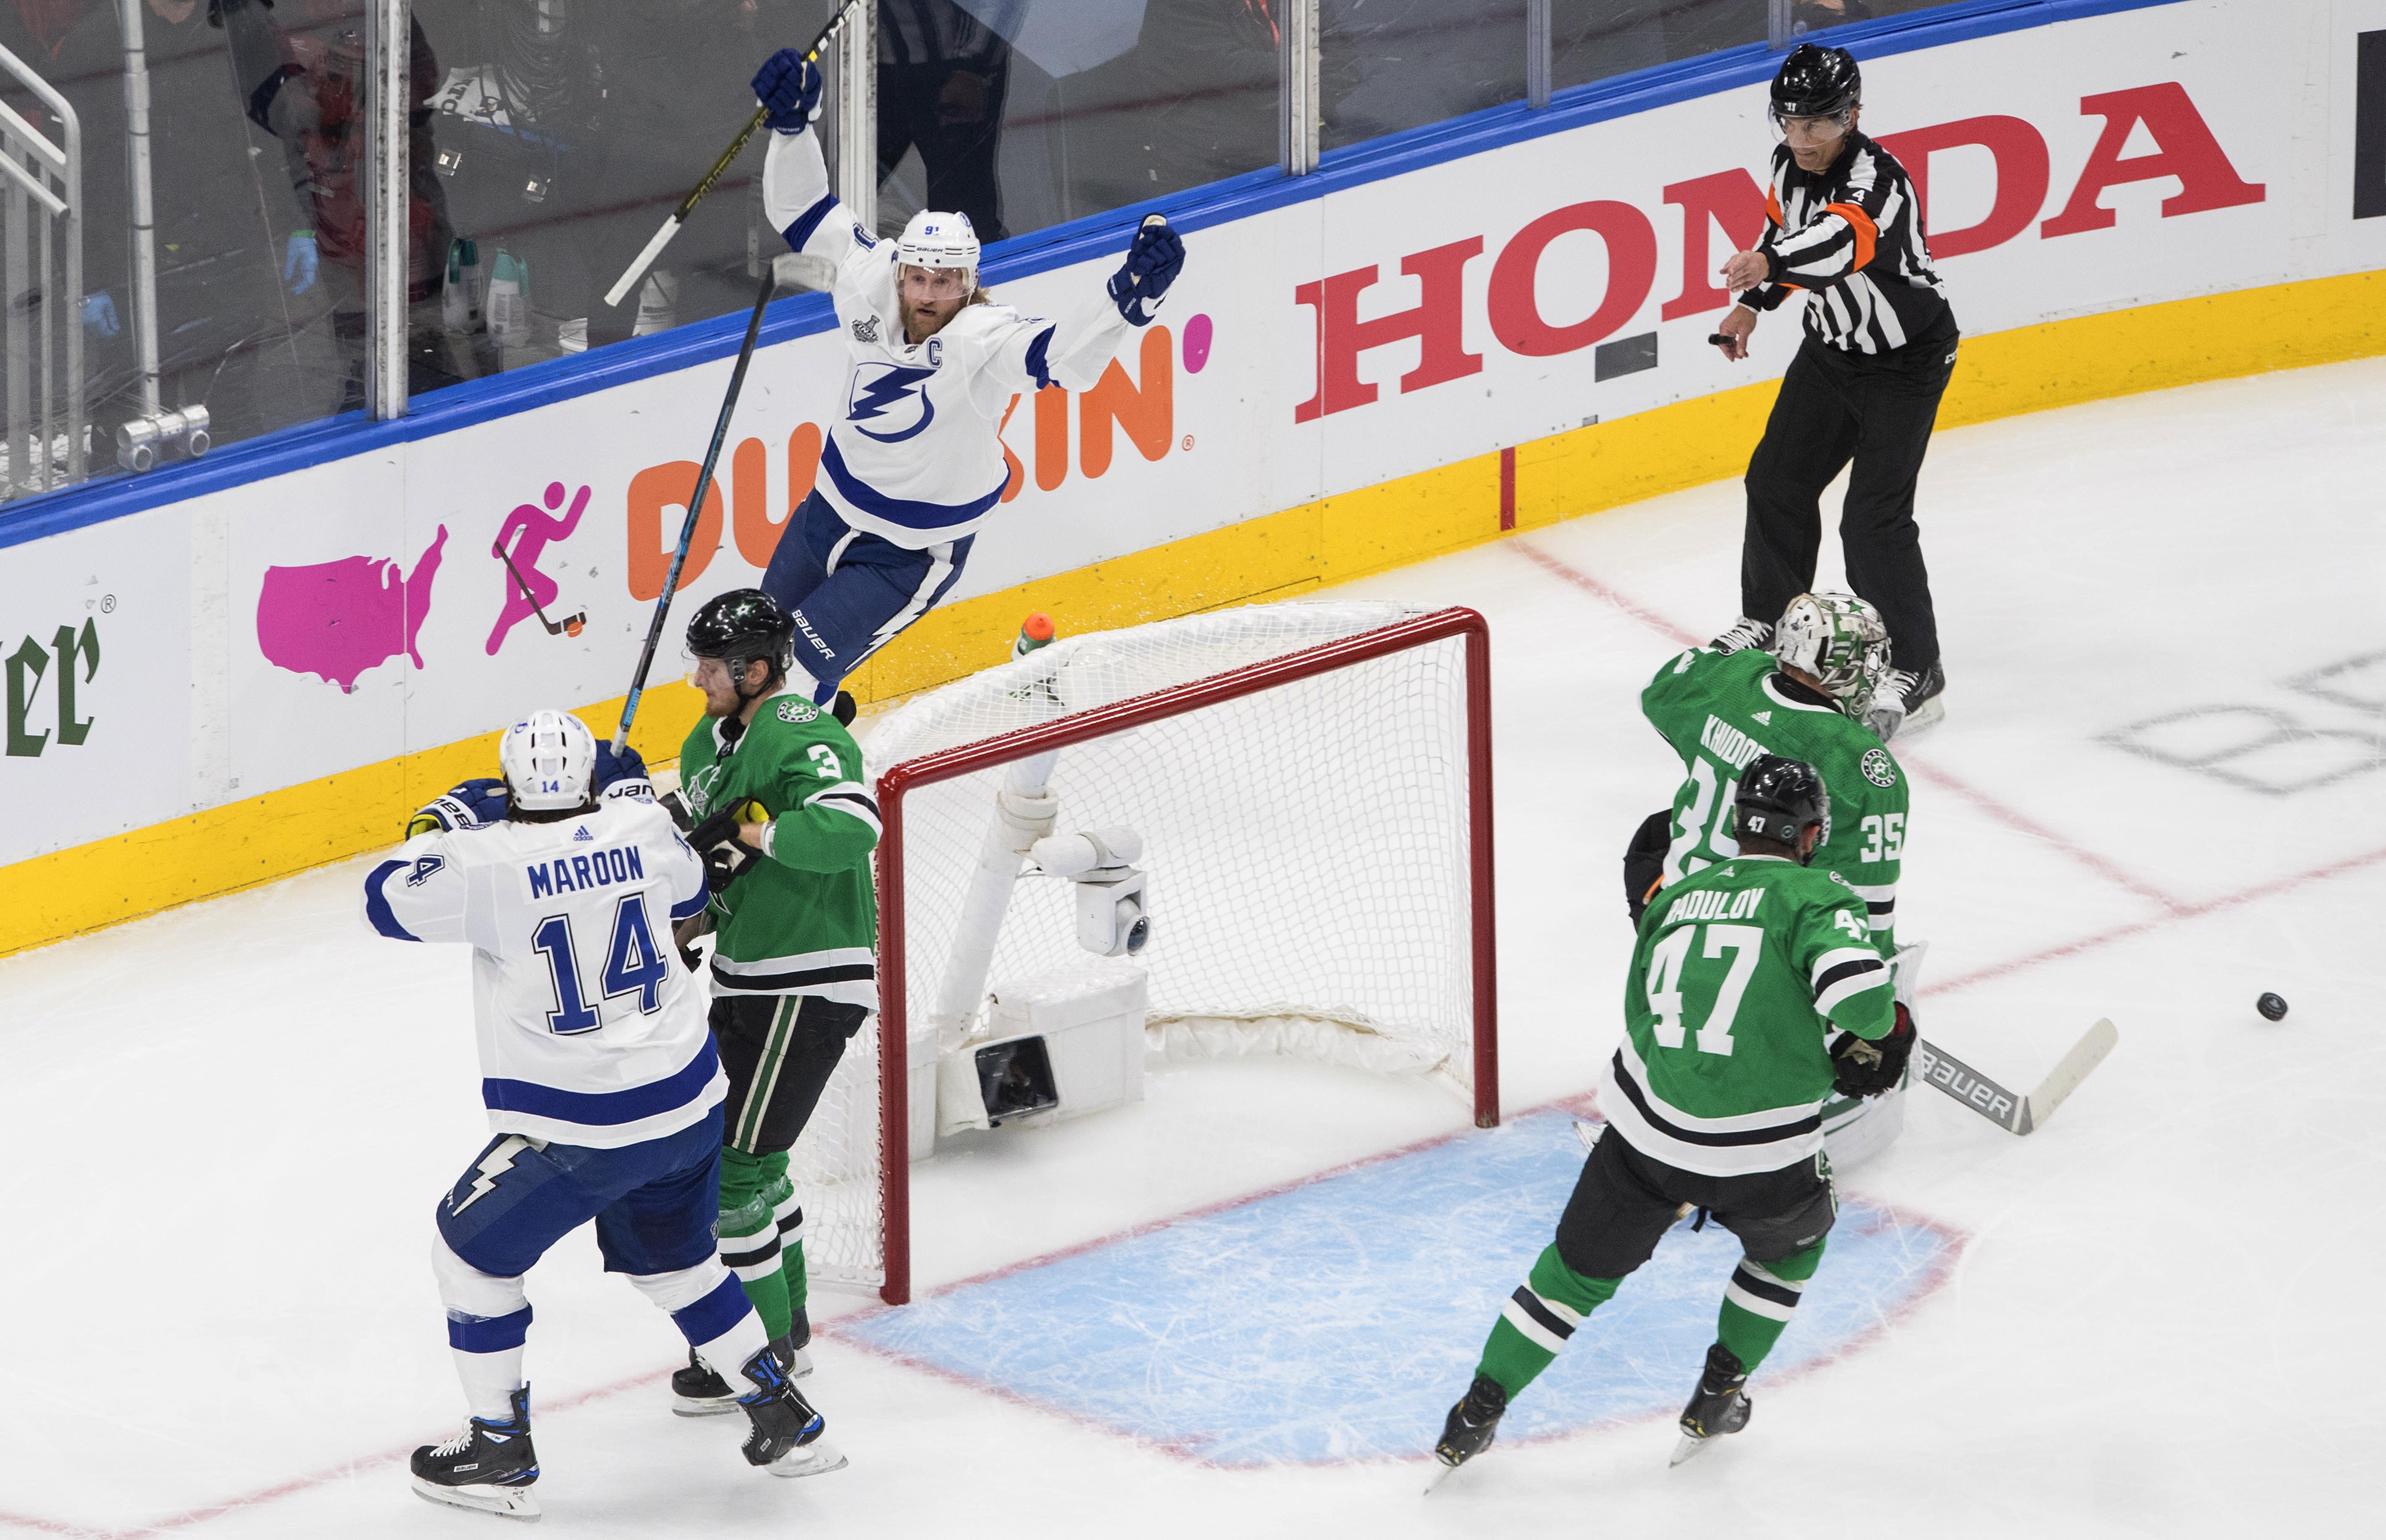 Tampa Bay Lightning center Steven Stamkos, top left, celebrates his goal against Dallas Stars goaltender Anton Khudobin (35) during the first period of Game 3 of the NHL hockey Stanley Cup Final, Wednesday, Sept. 23, 2020, in Edmonton, Alberta. (Jason Franson/The Canadian Press via AP)